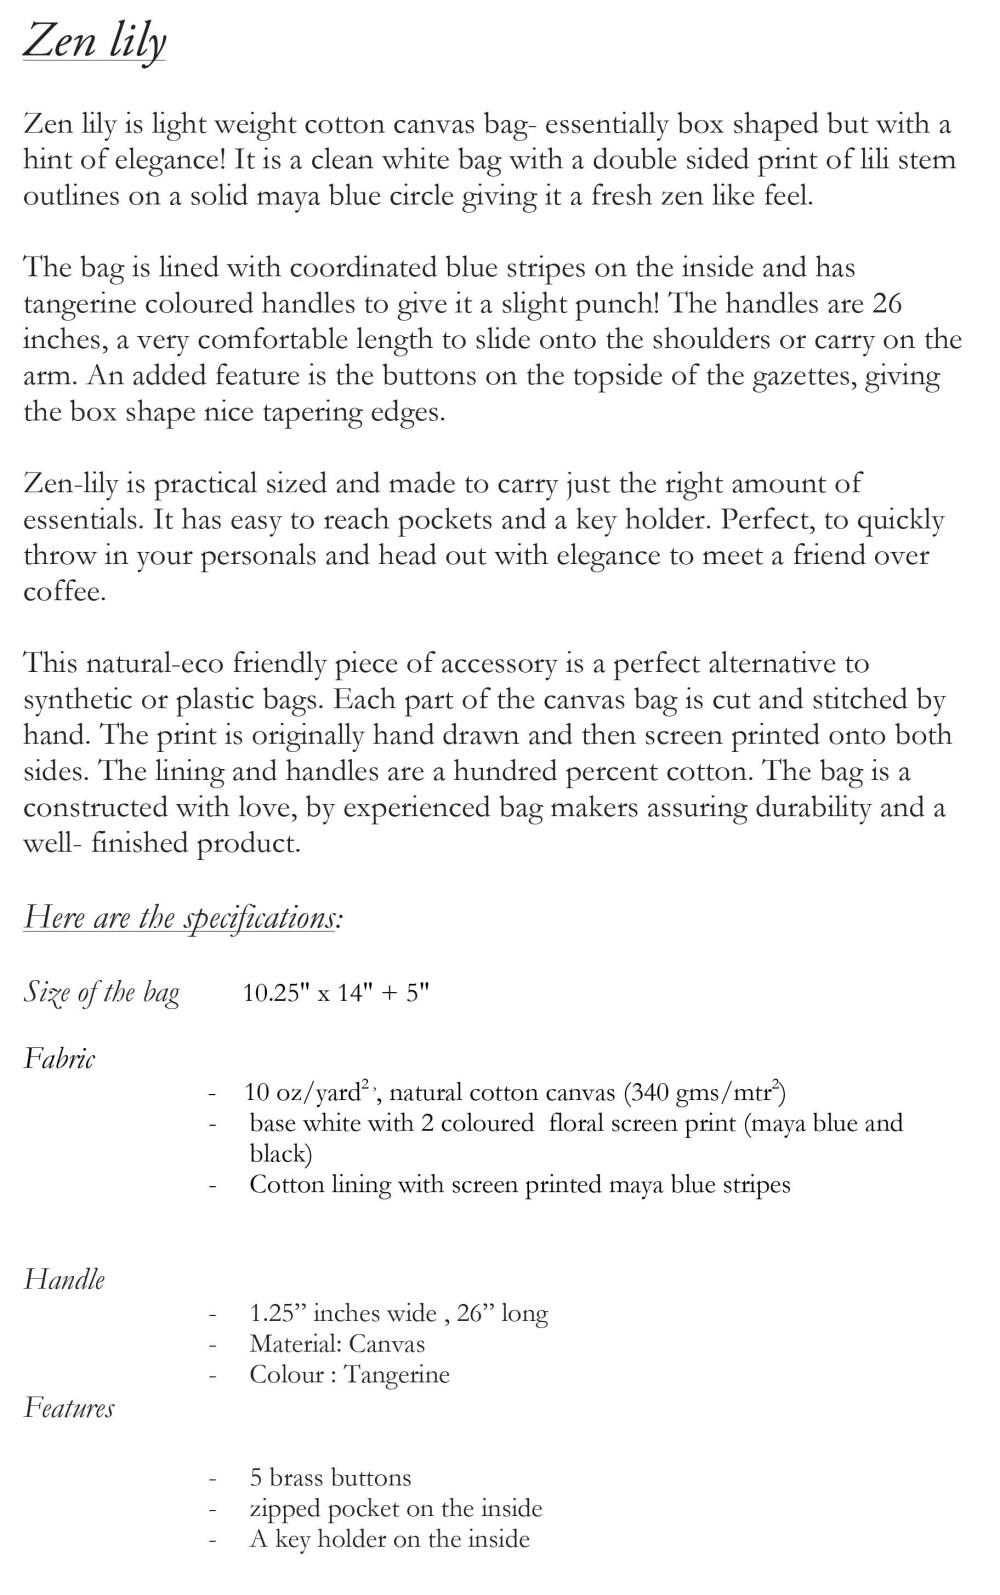 Microsoft Word - Zen lily.docx